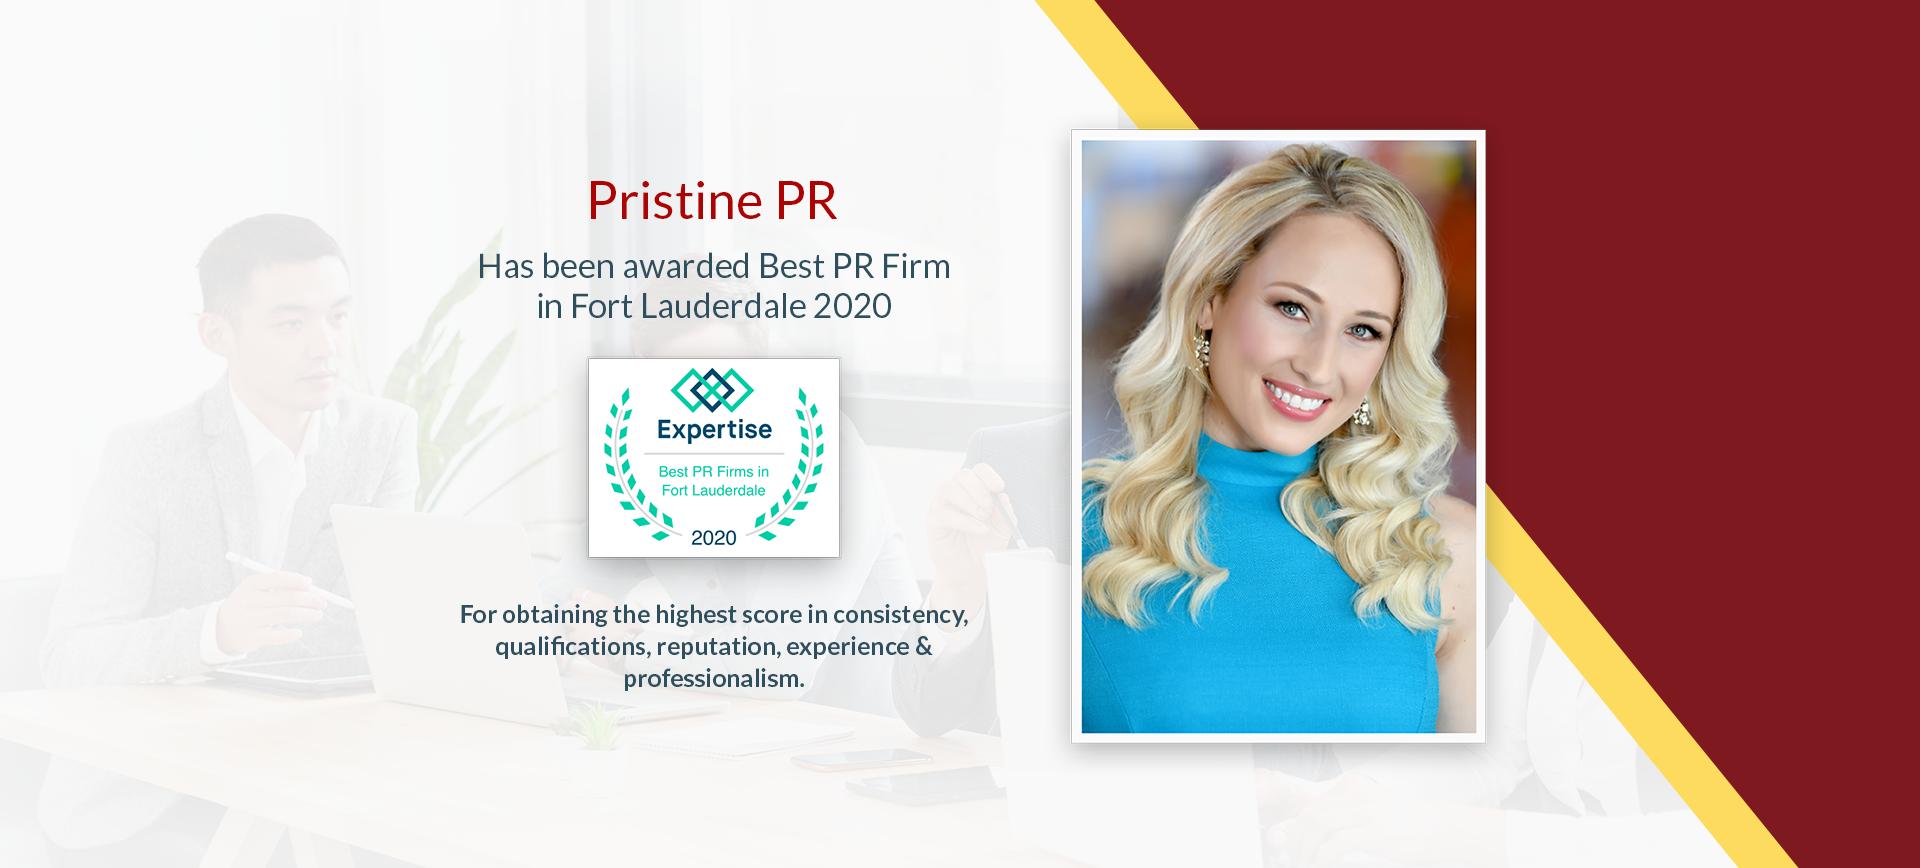 Pristine PR Awarded 'Best PR Firm' In Fort Lauderdale 2020